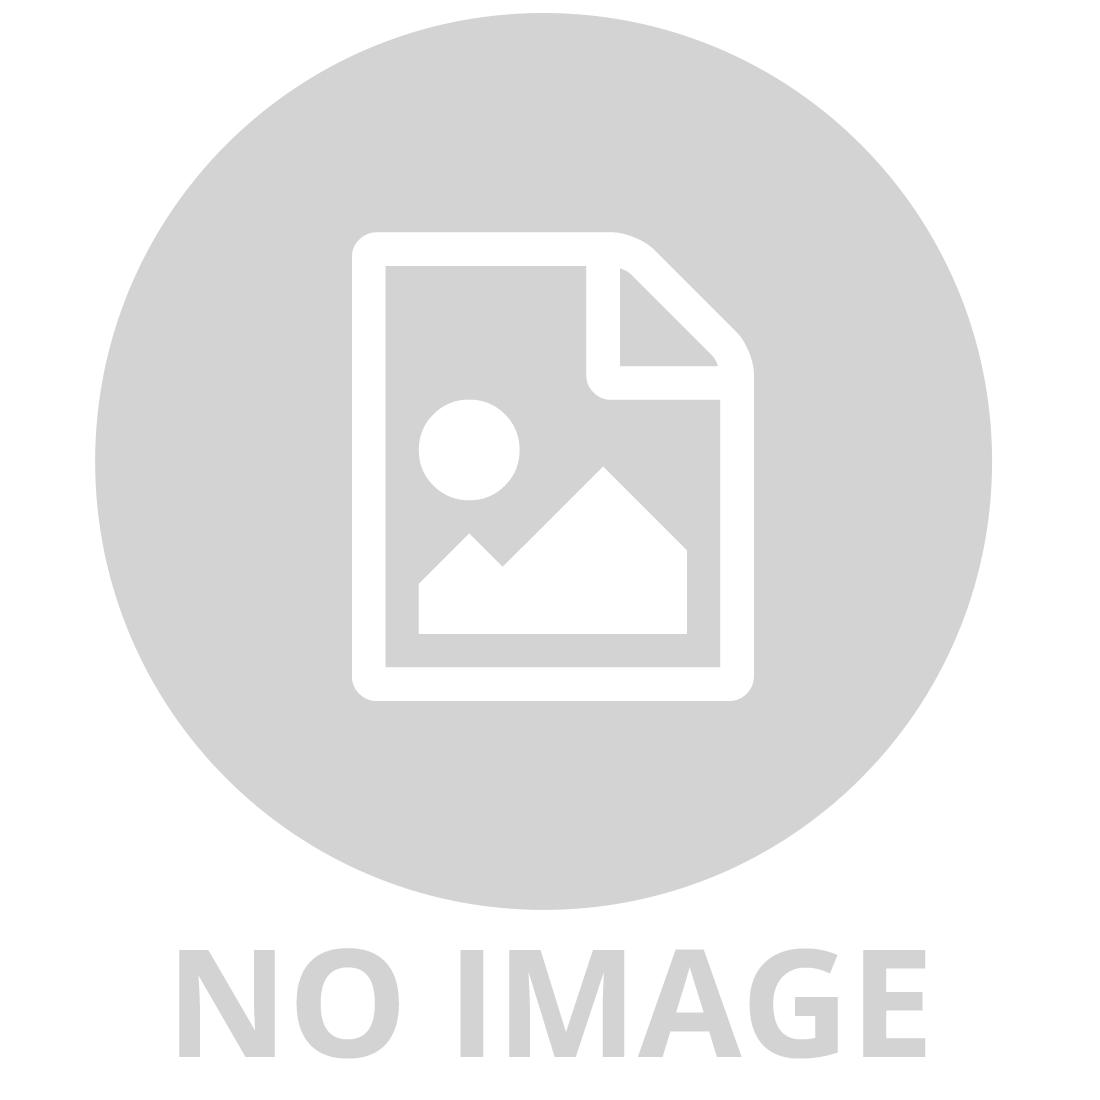 DISNEY PIXAR CARS - NATALIE CERTAIN